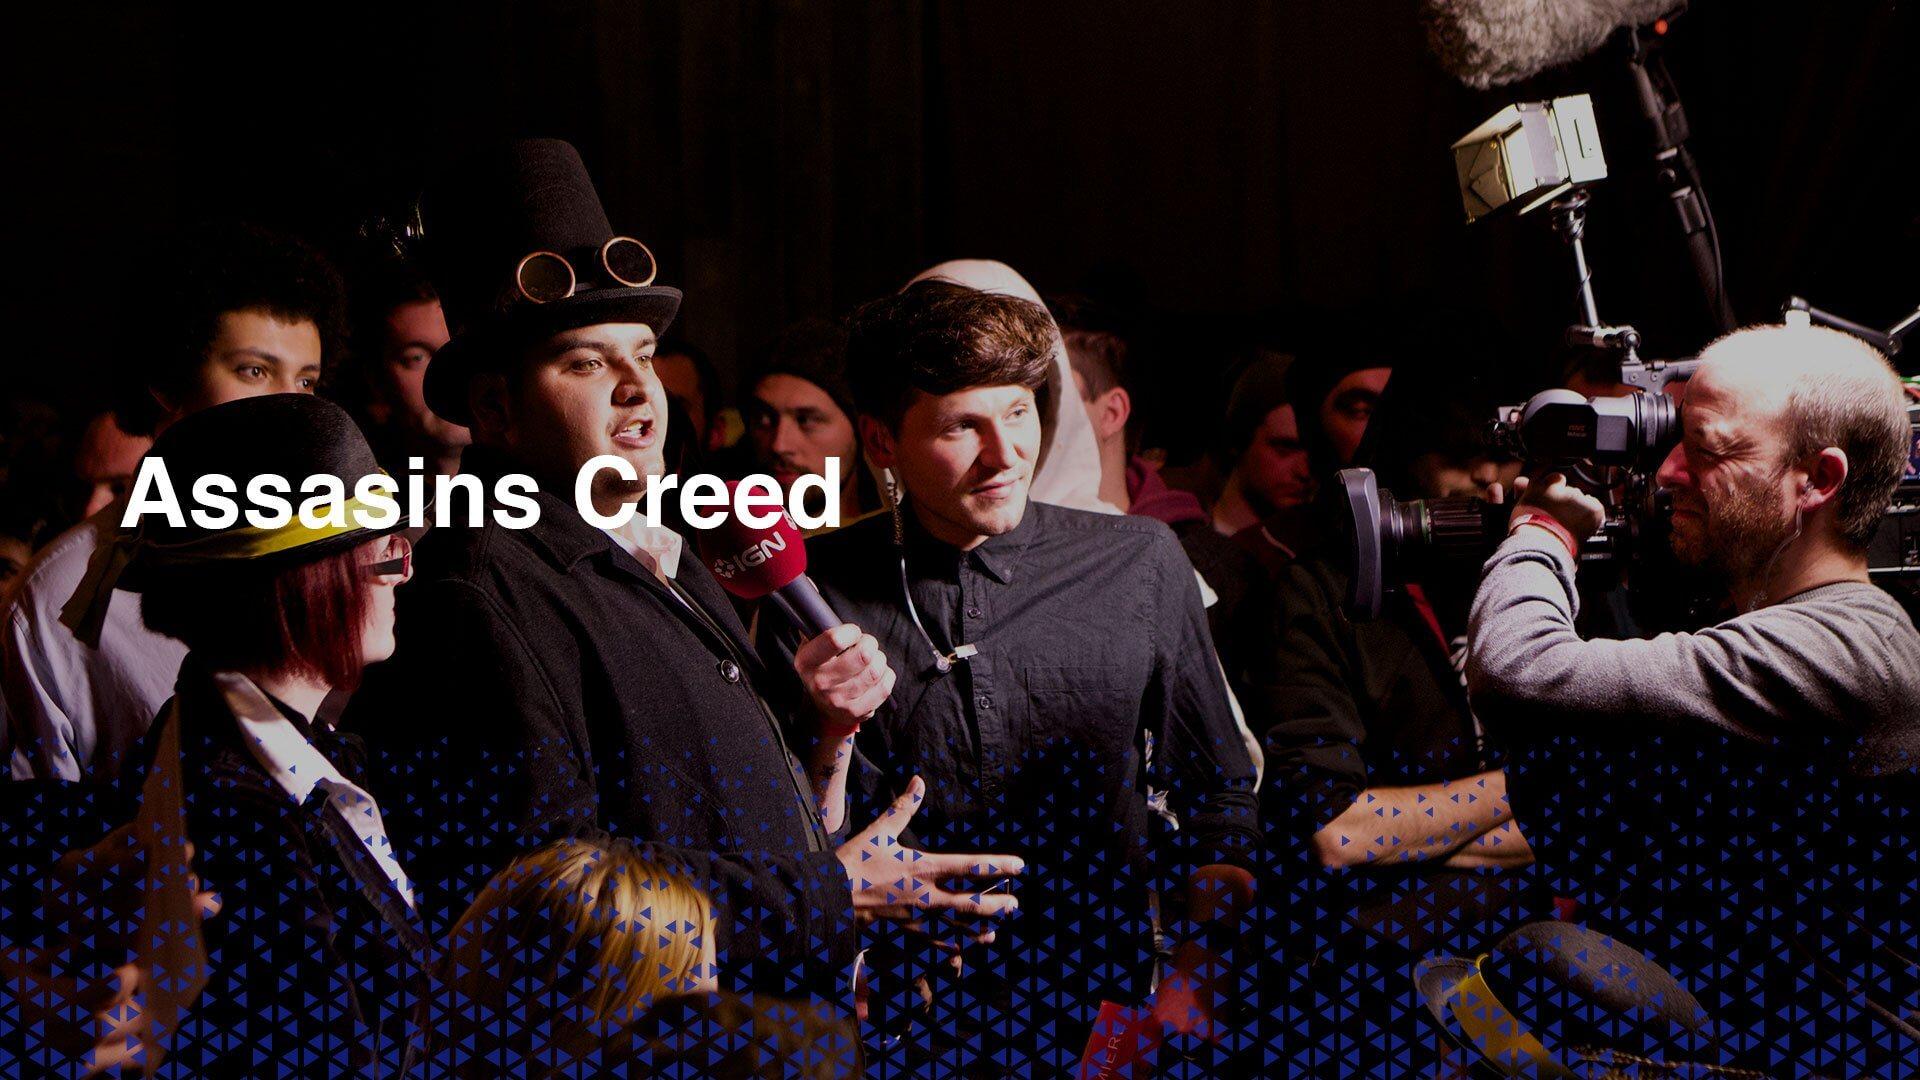 Assassins Creed Live Broadcast event